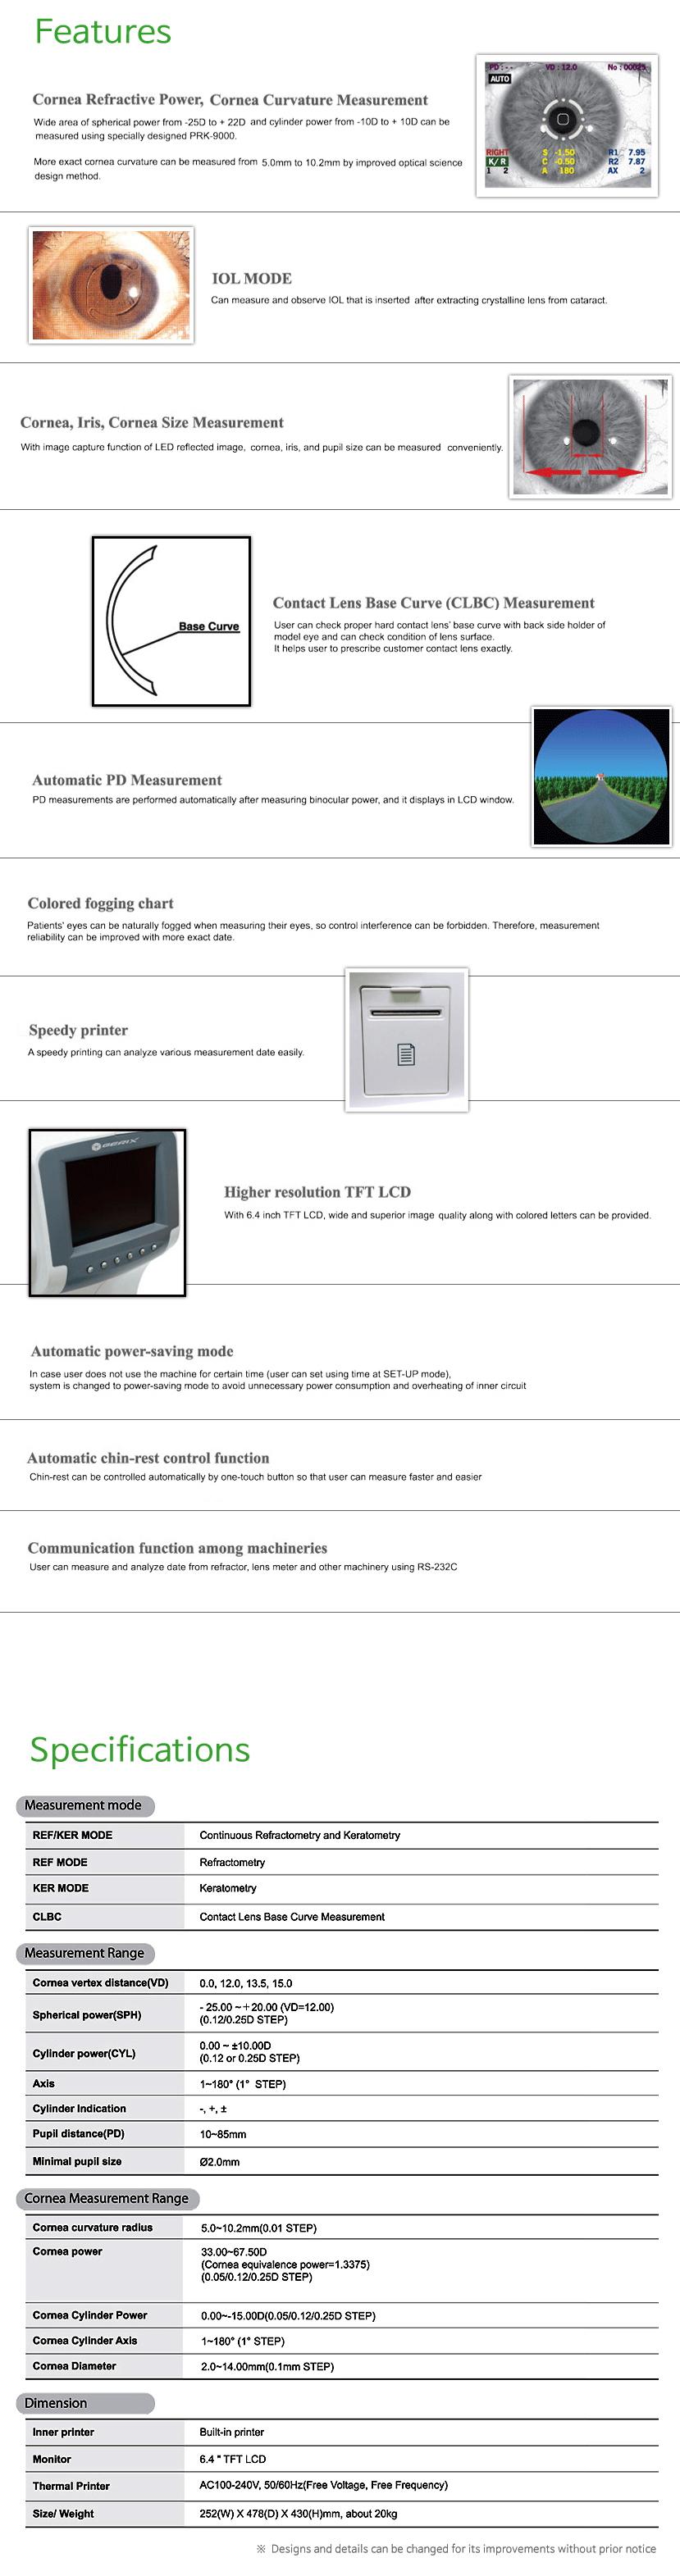 GERIX Auto Ref/Keratometer PRK-9000